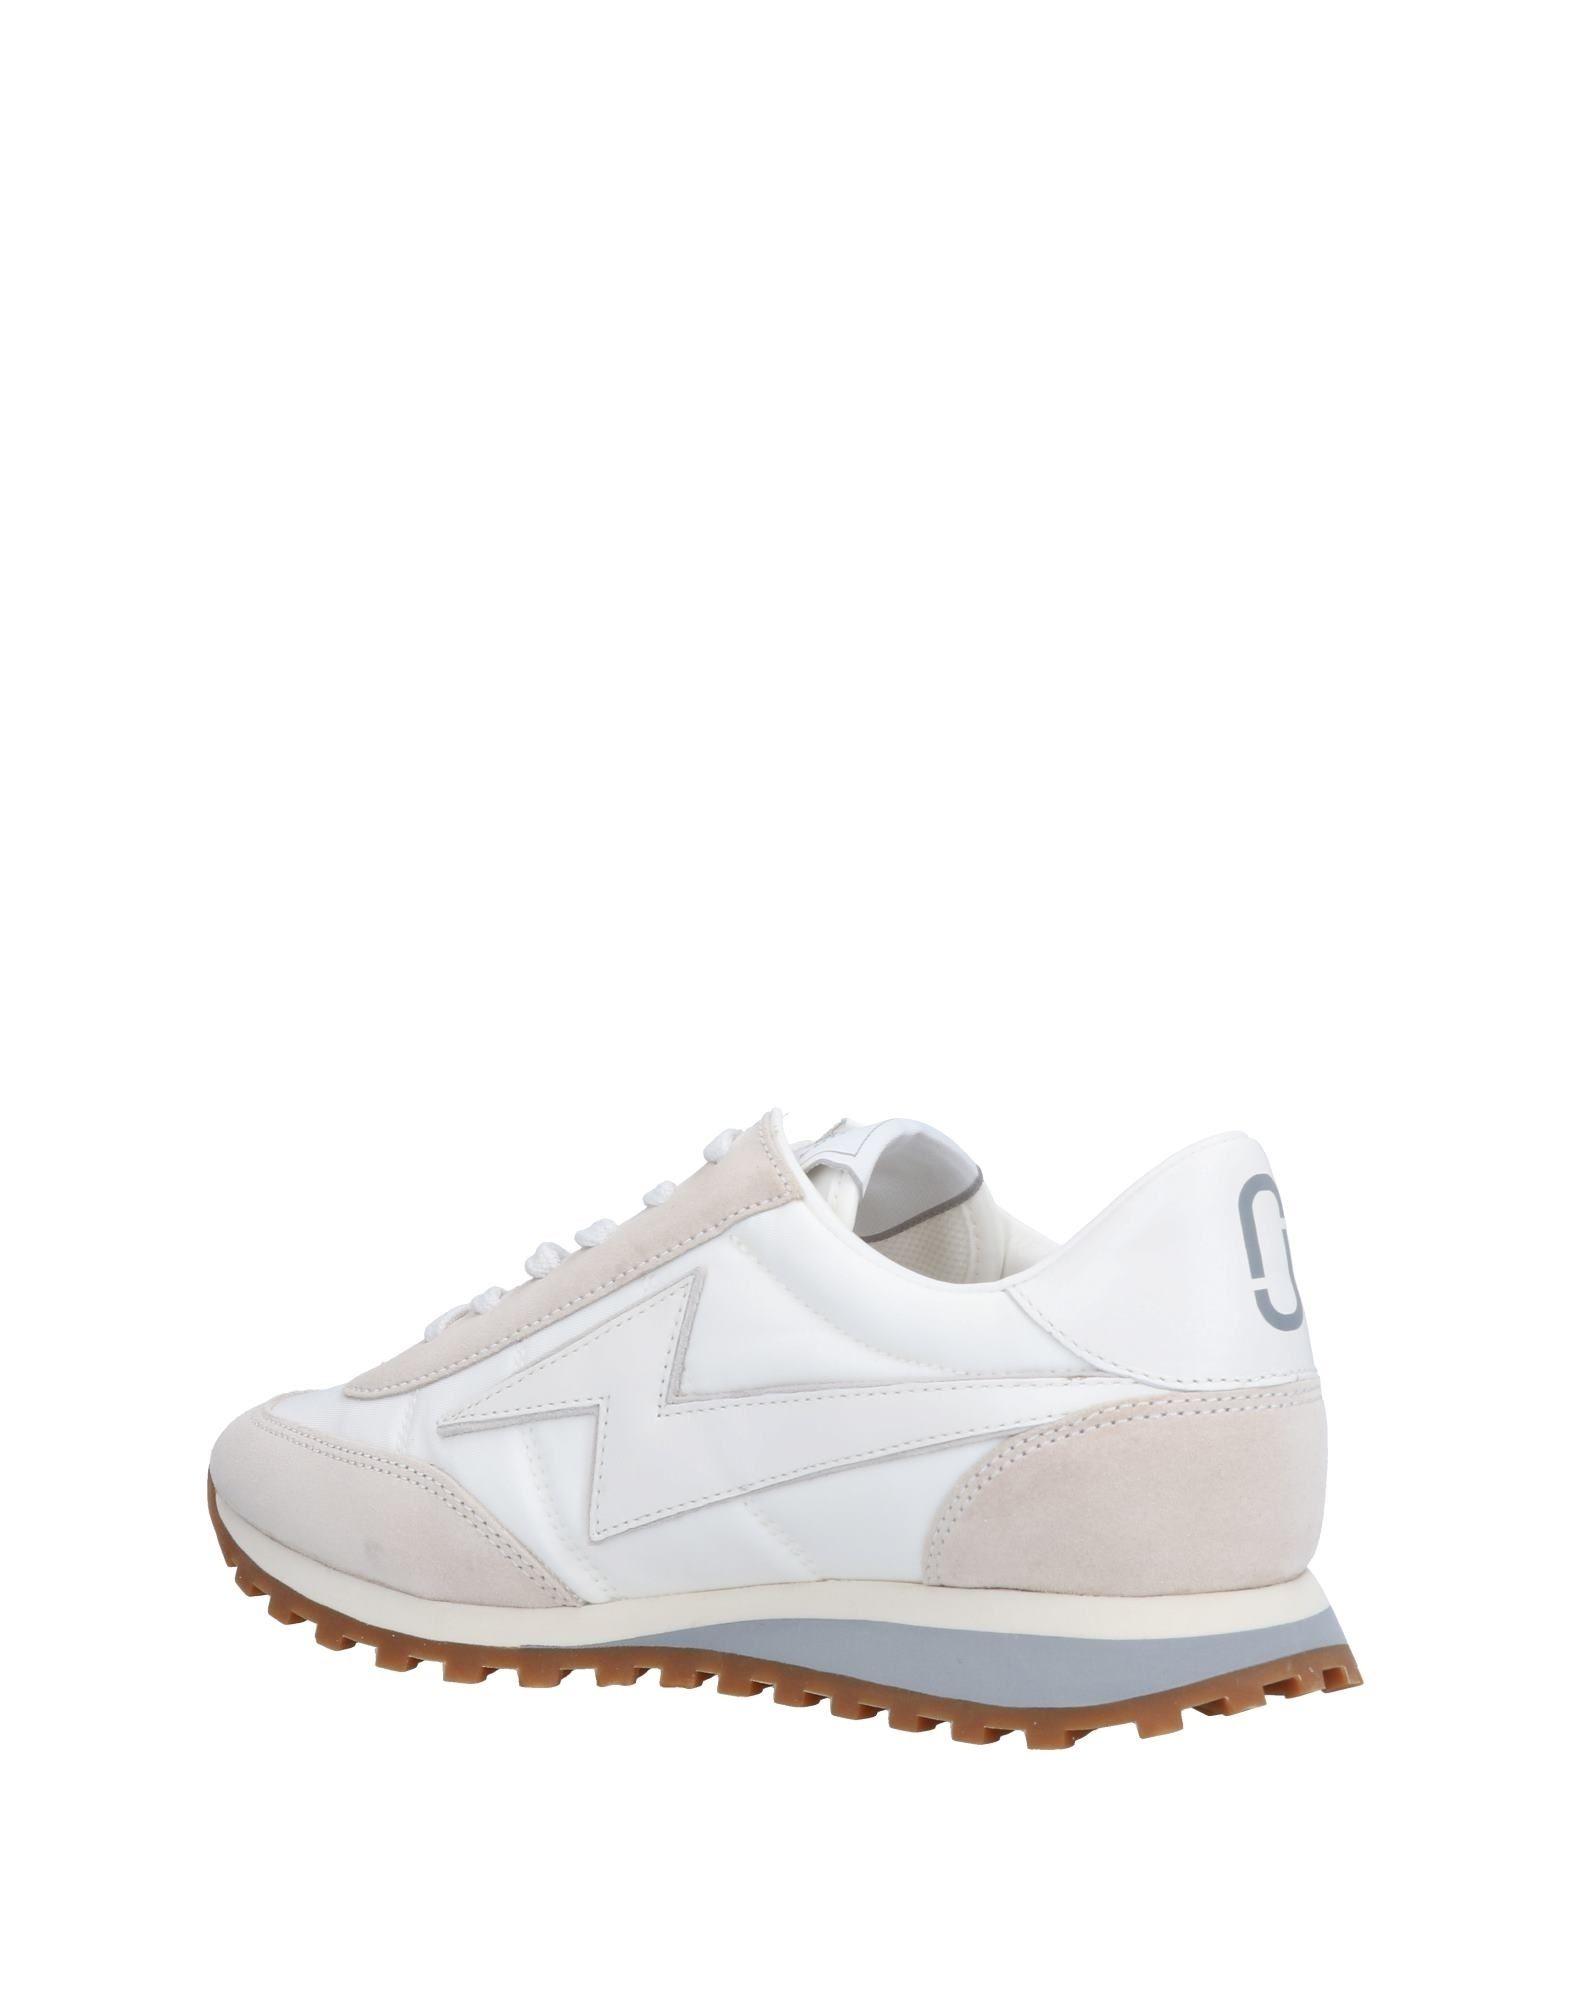 Stilvolle Jacobs billige Schuhe Marc Jacobs Stilvolle Sneakers Damen  11500969DO 71482b